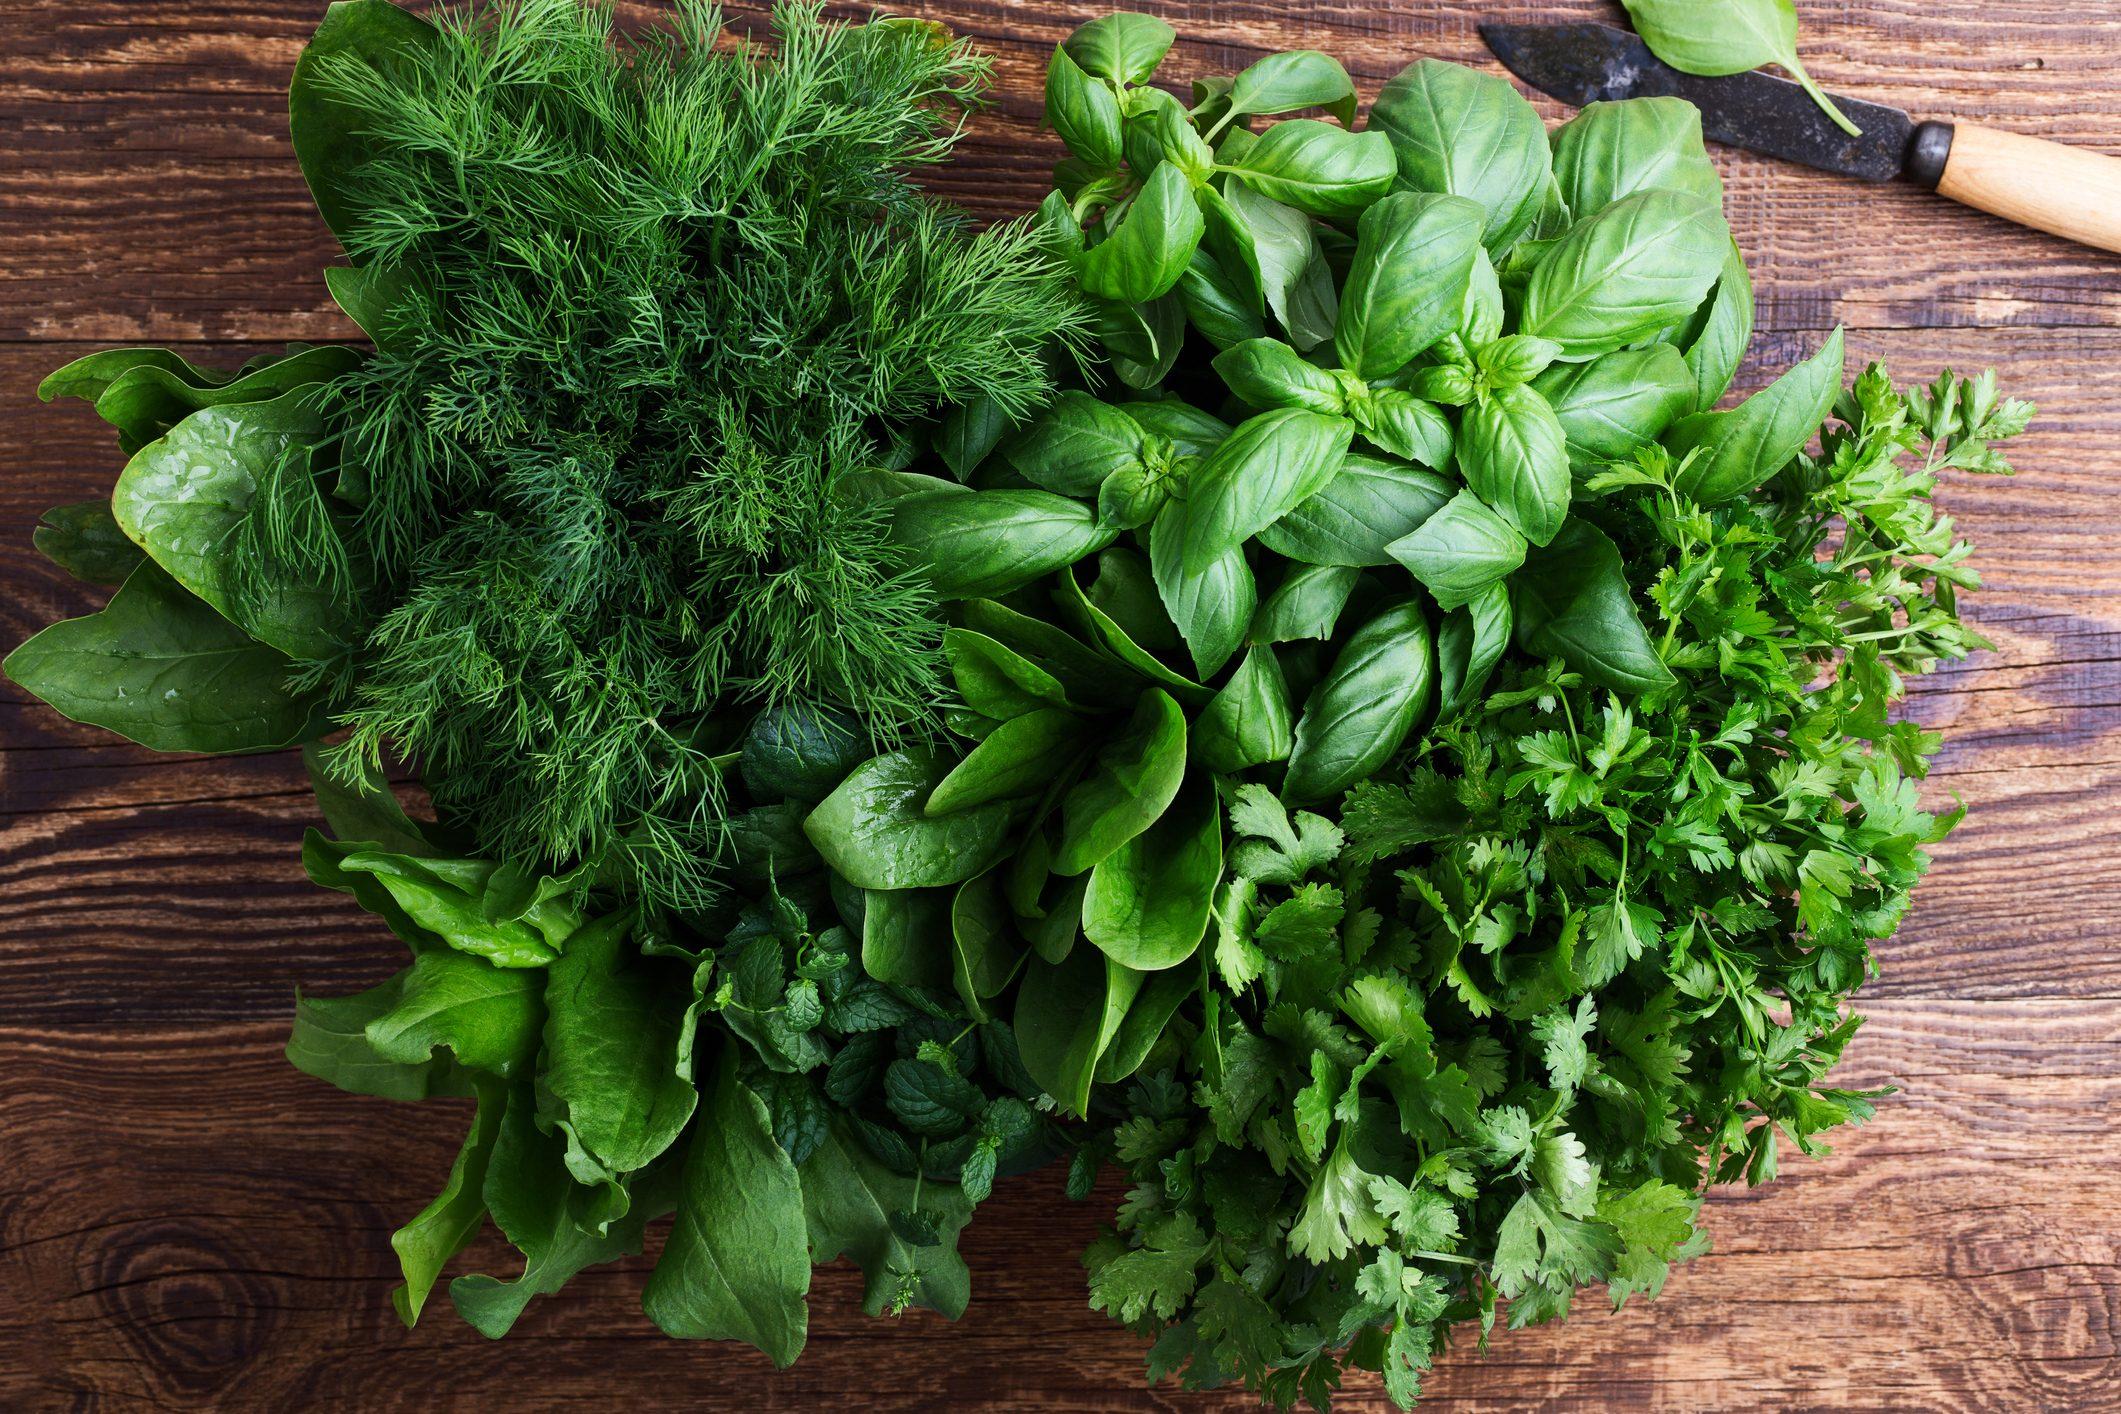 Fresh organic aromatic and culinary herbs